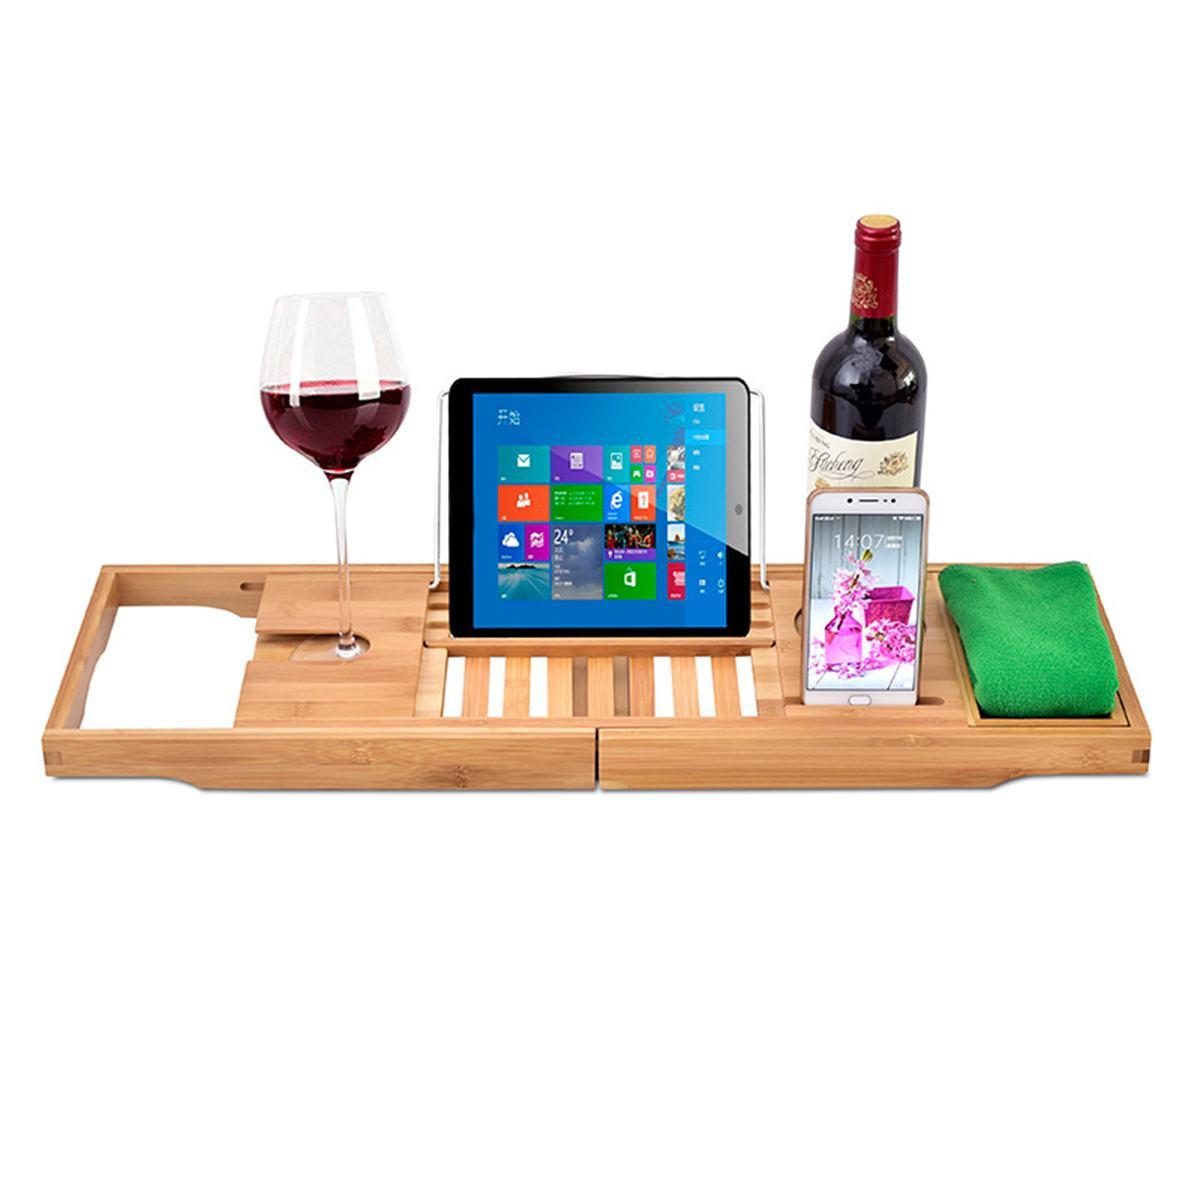 Bathroom Retractable Bamboo Bath Bathtub Shelf Bridge Tub Caddy Tray Rack Wine Glass Book Holder Bathtub Rack Support